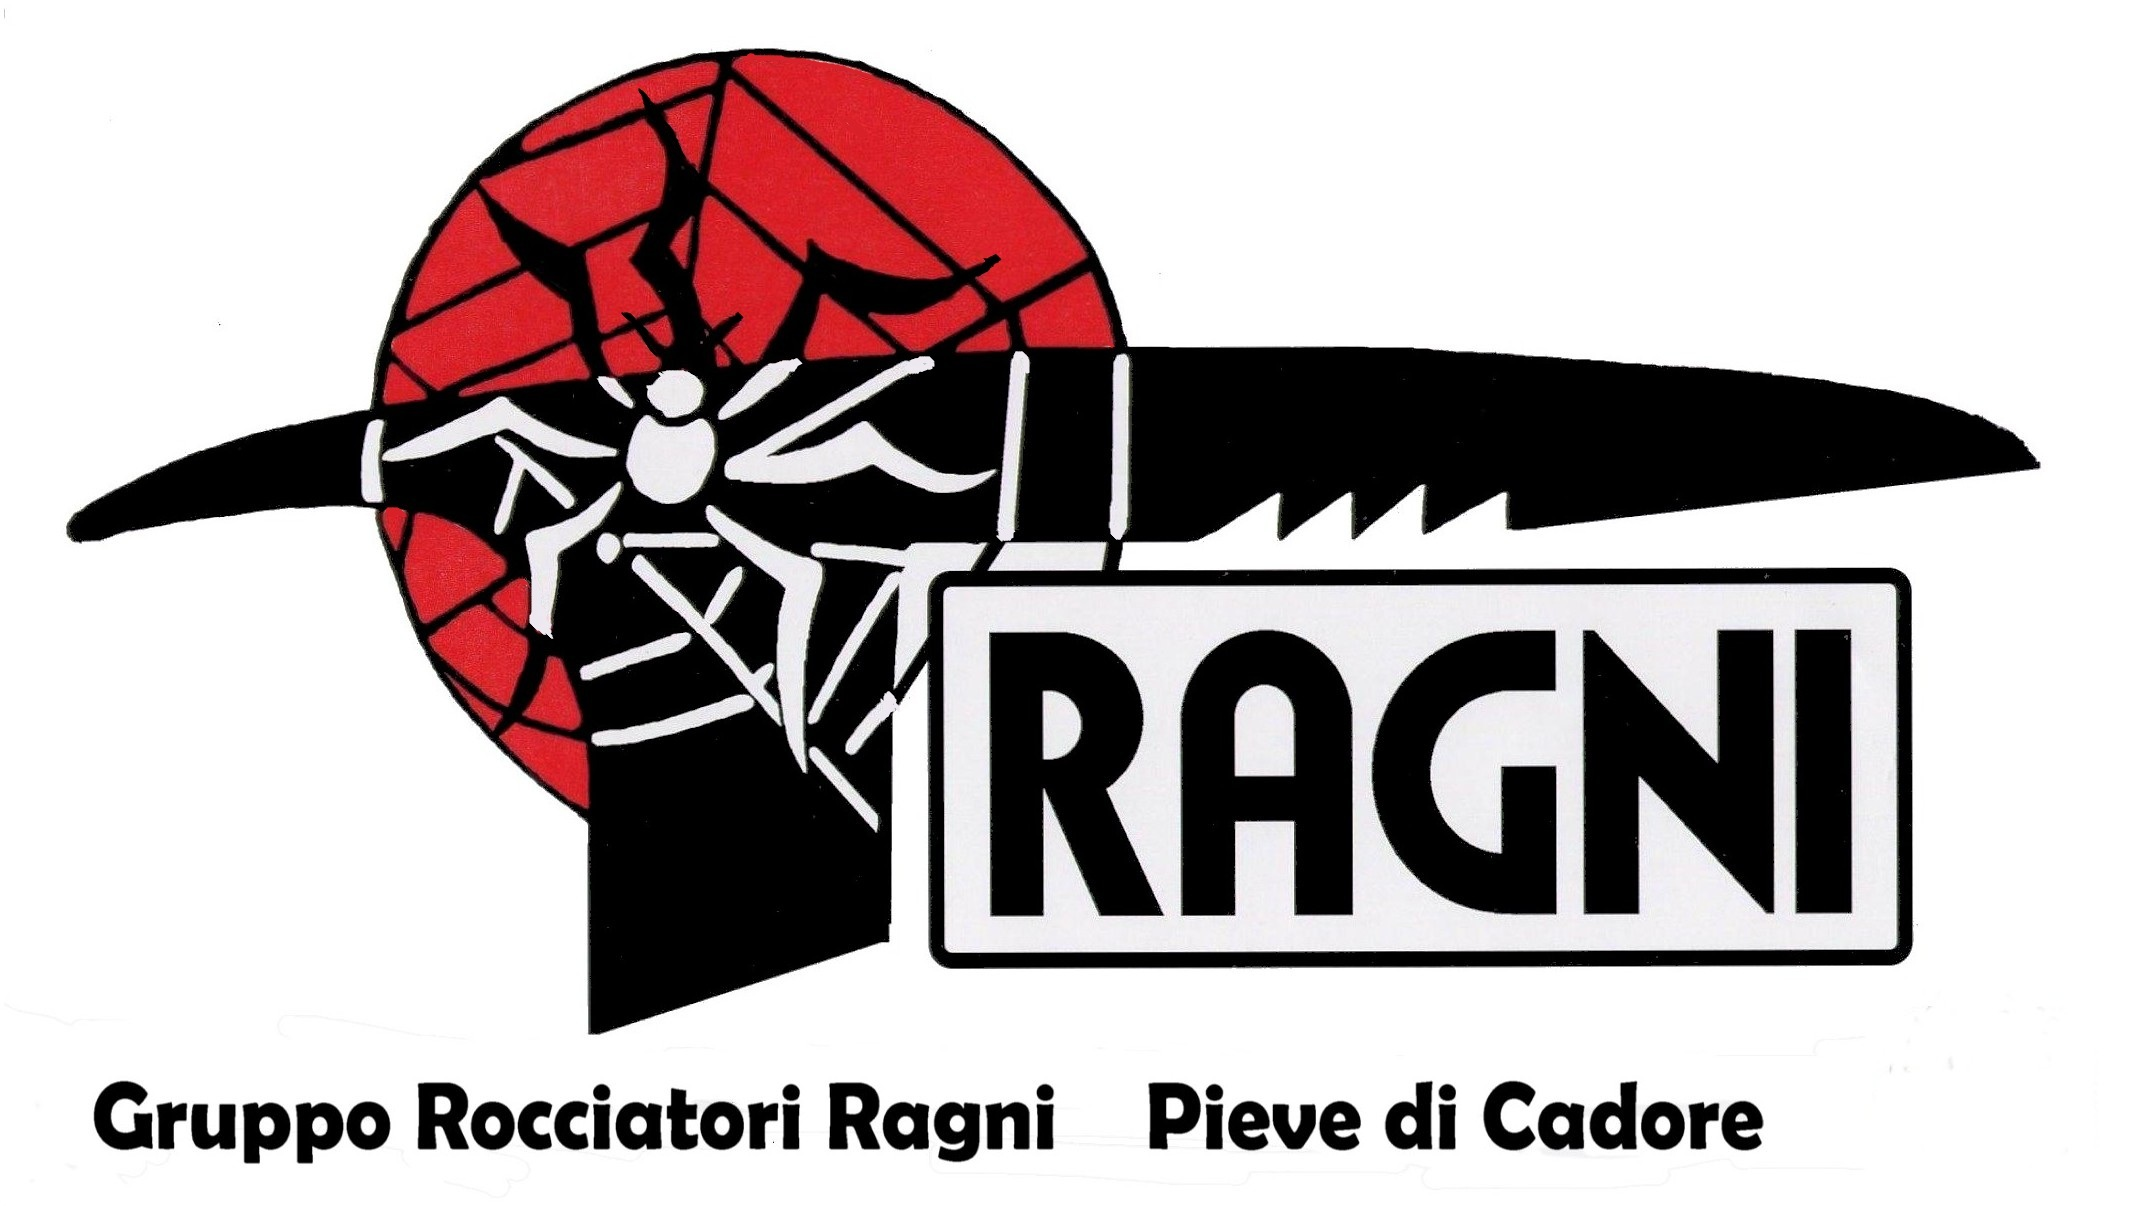 Gruppo Rocciatori Ragni - Pieve di Cadore